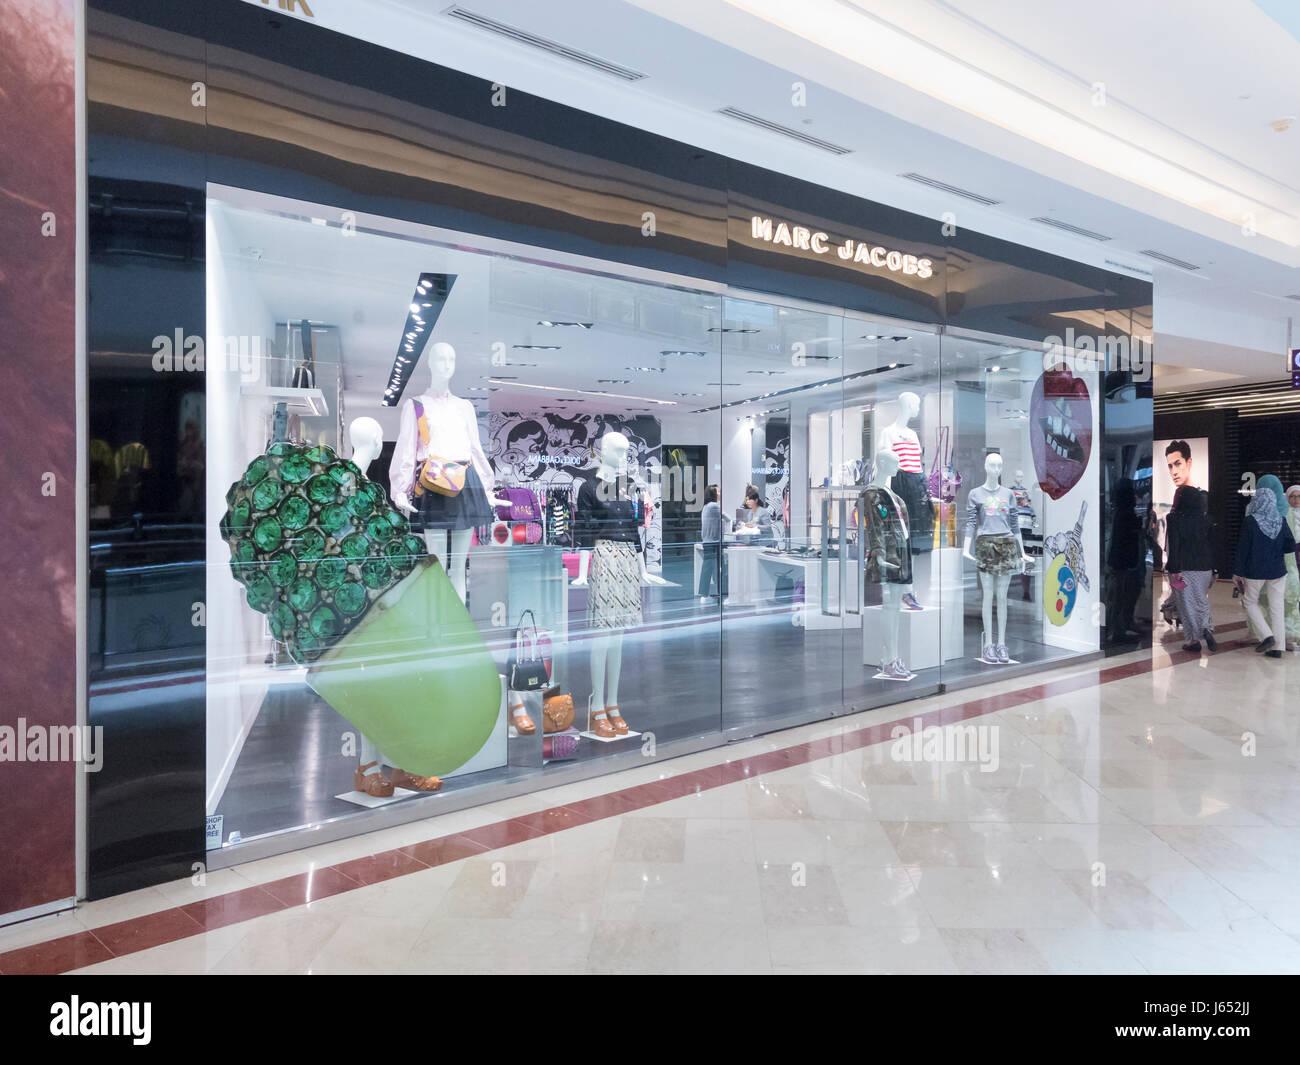 official photos dab05 4ba24 Marc Jacobs shop, Malaysia Stock Photo: 141482730 - Alamy